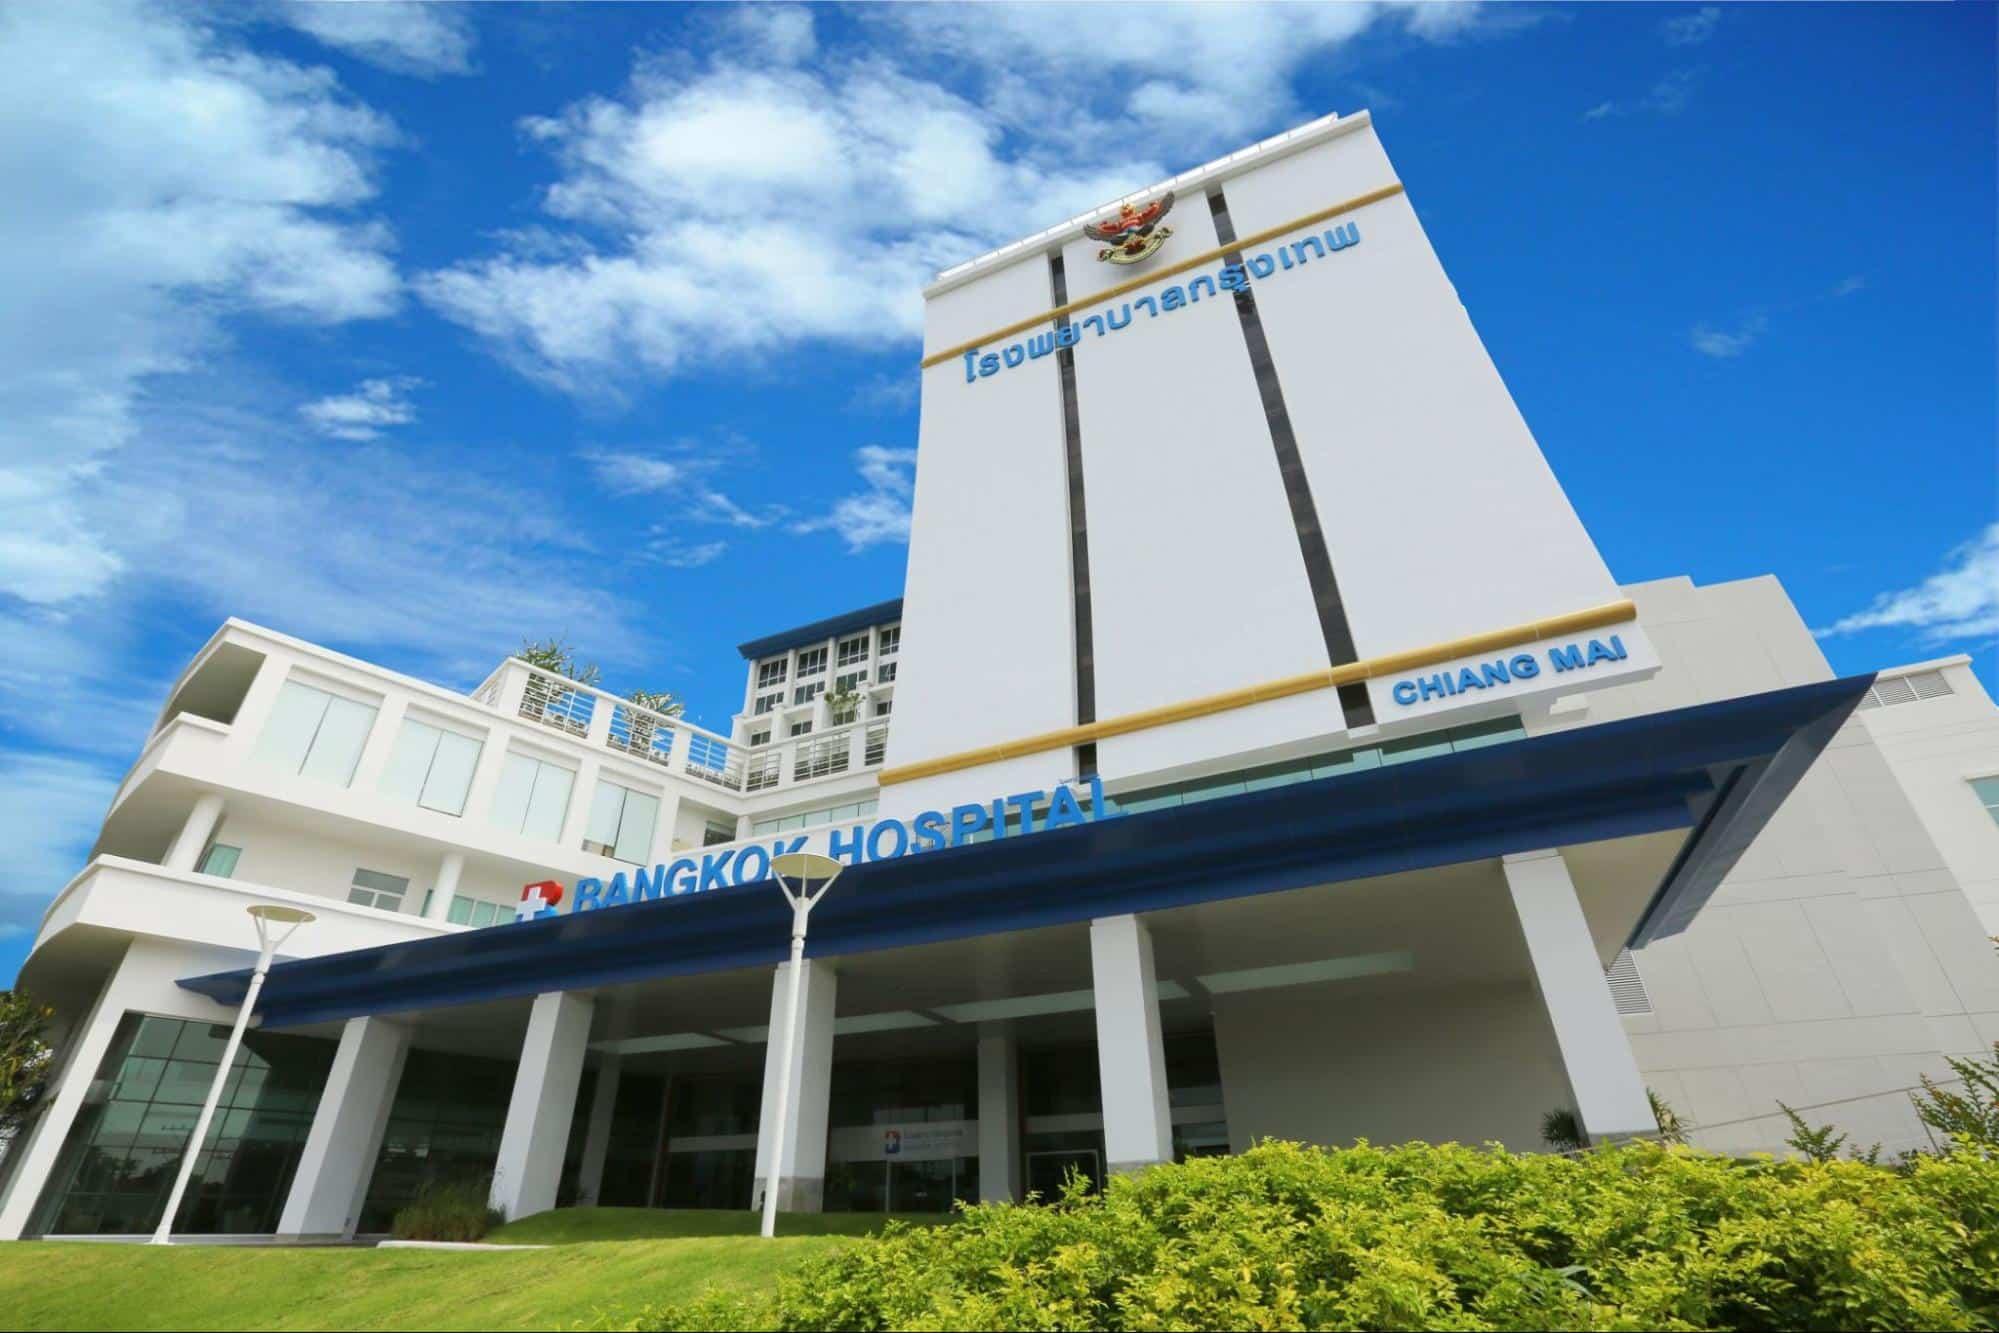 Bangkok Hospital, Chiang Mai